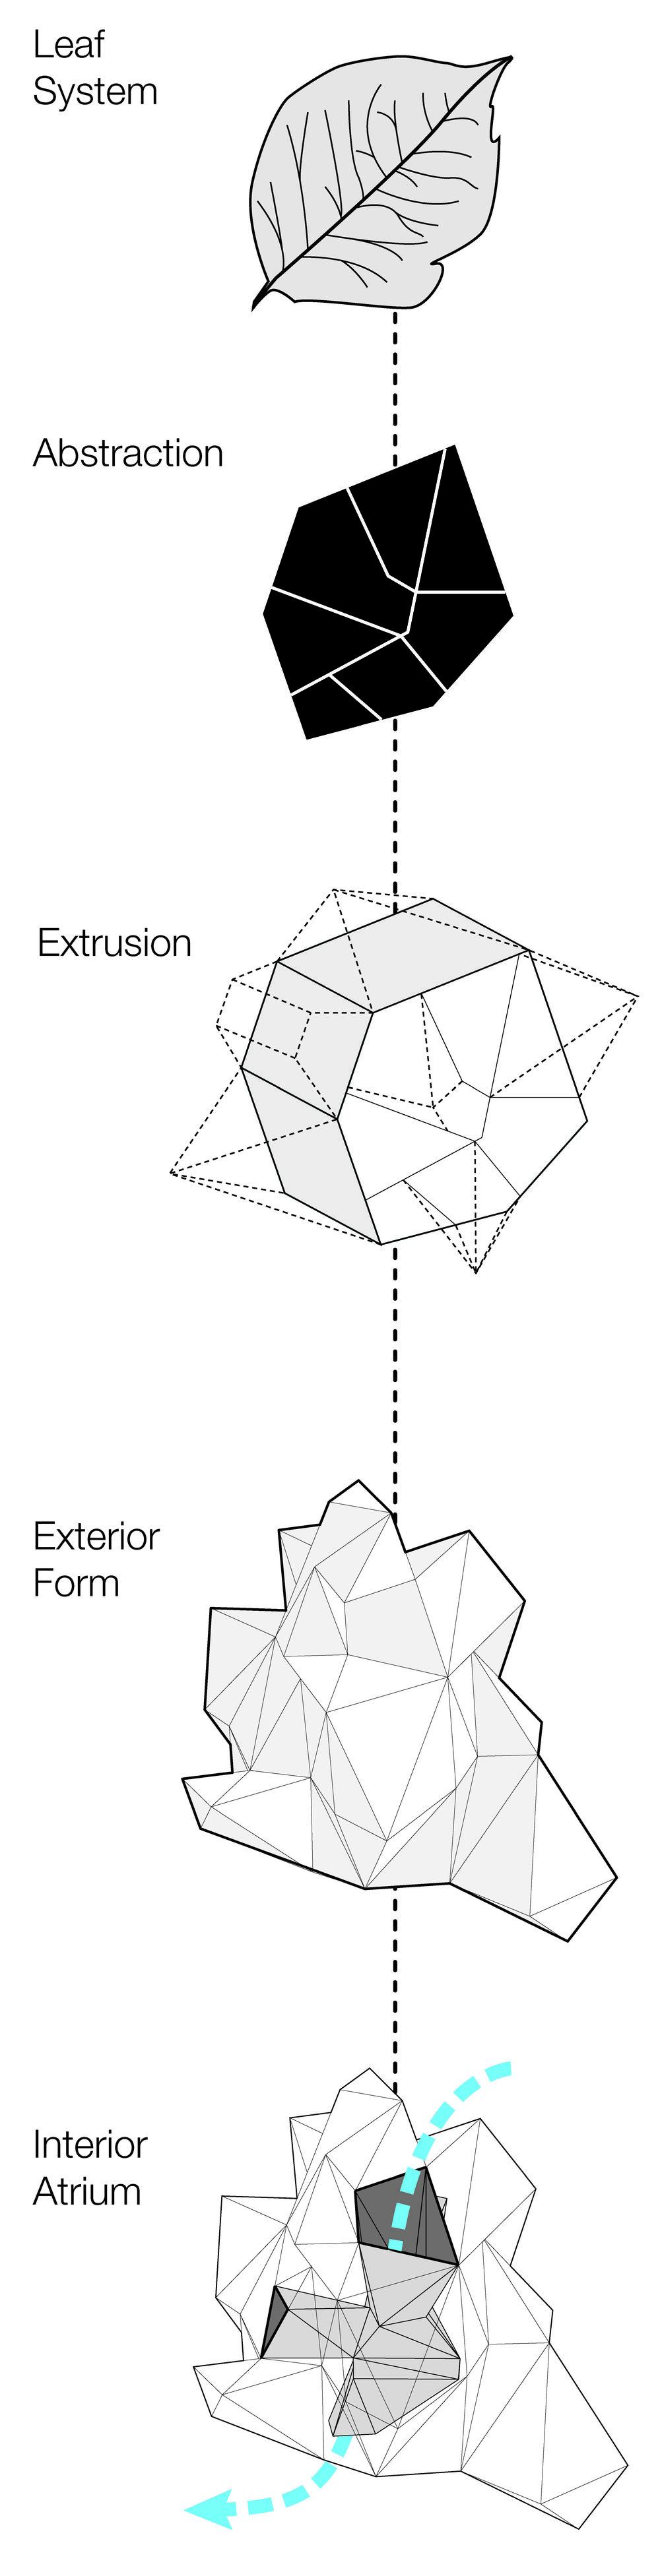 FinalFormDiagram.jpg